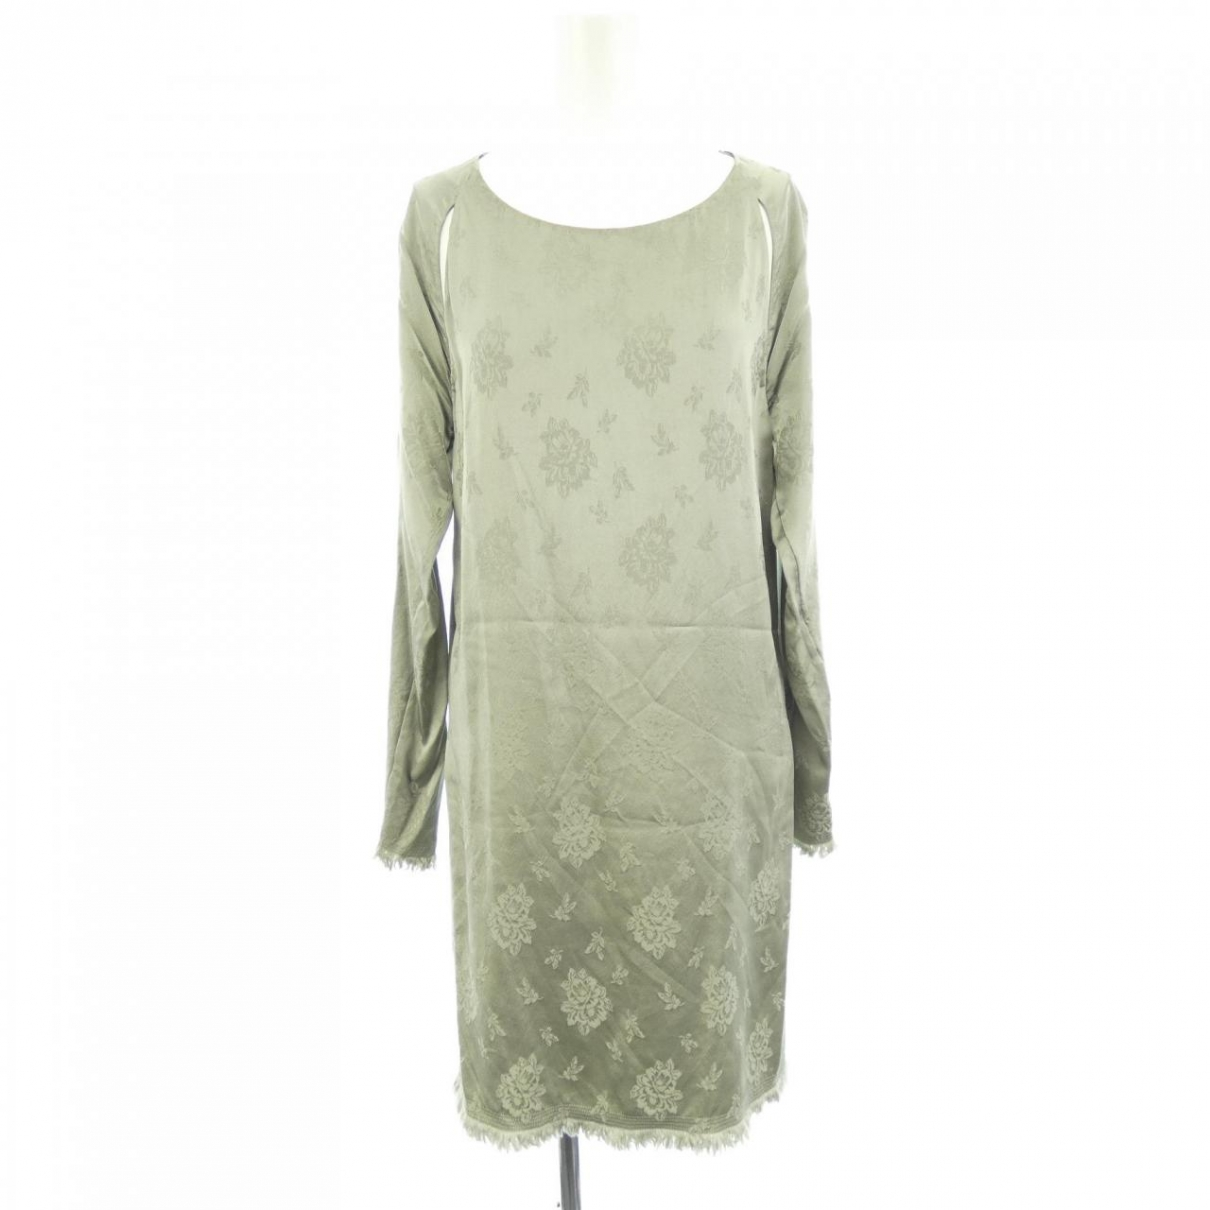 3.1 Phillip Lim \N Kleid in  Gruen Seide